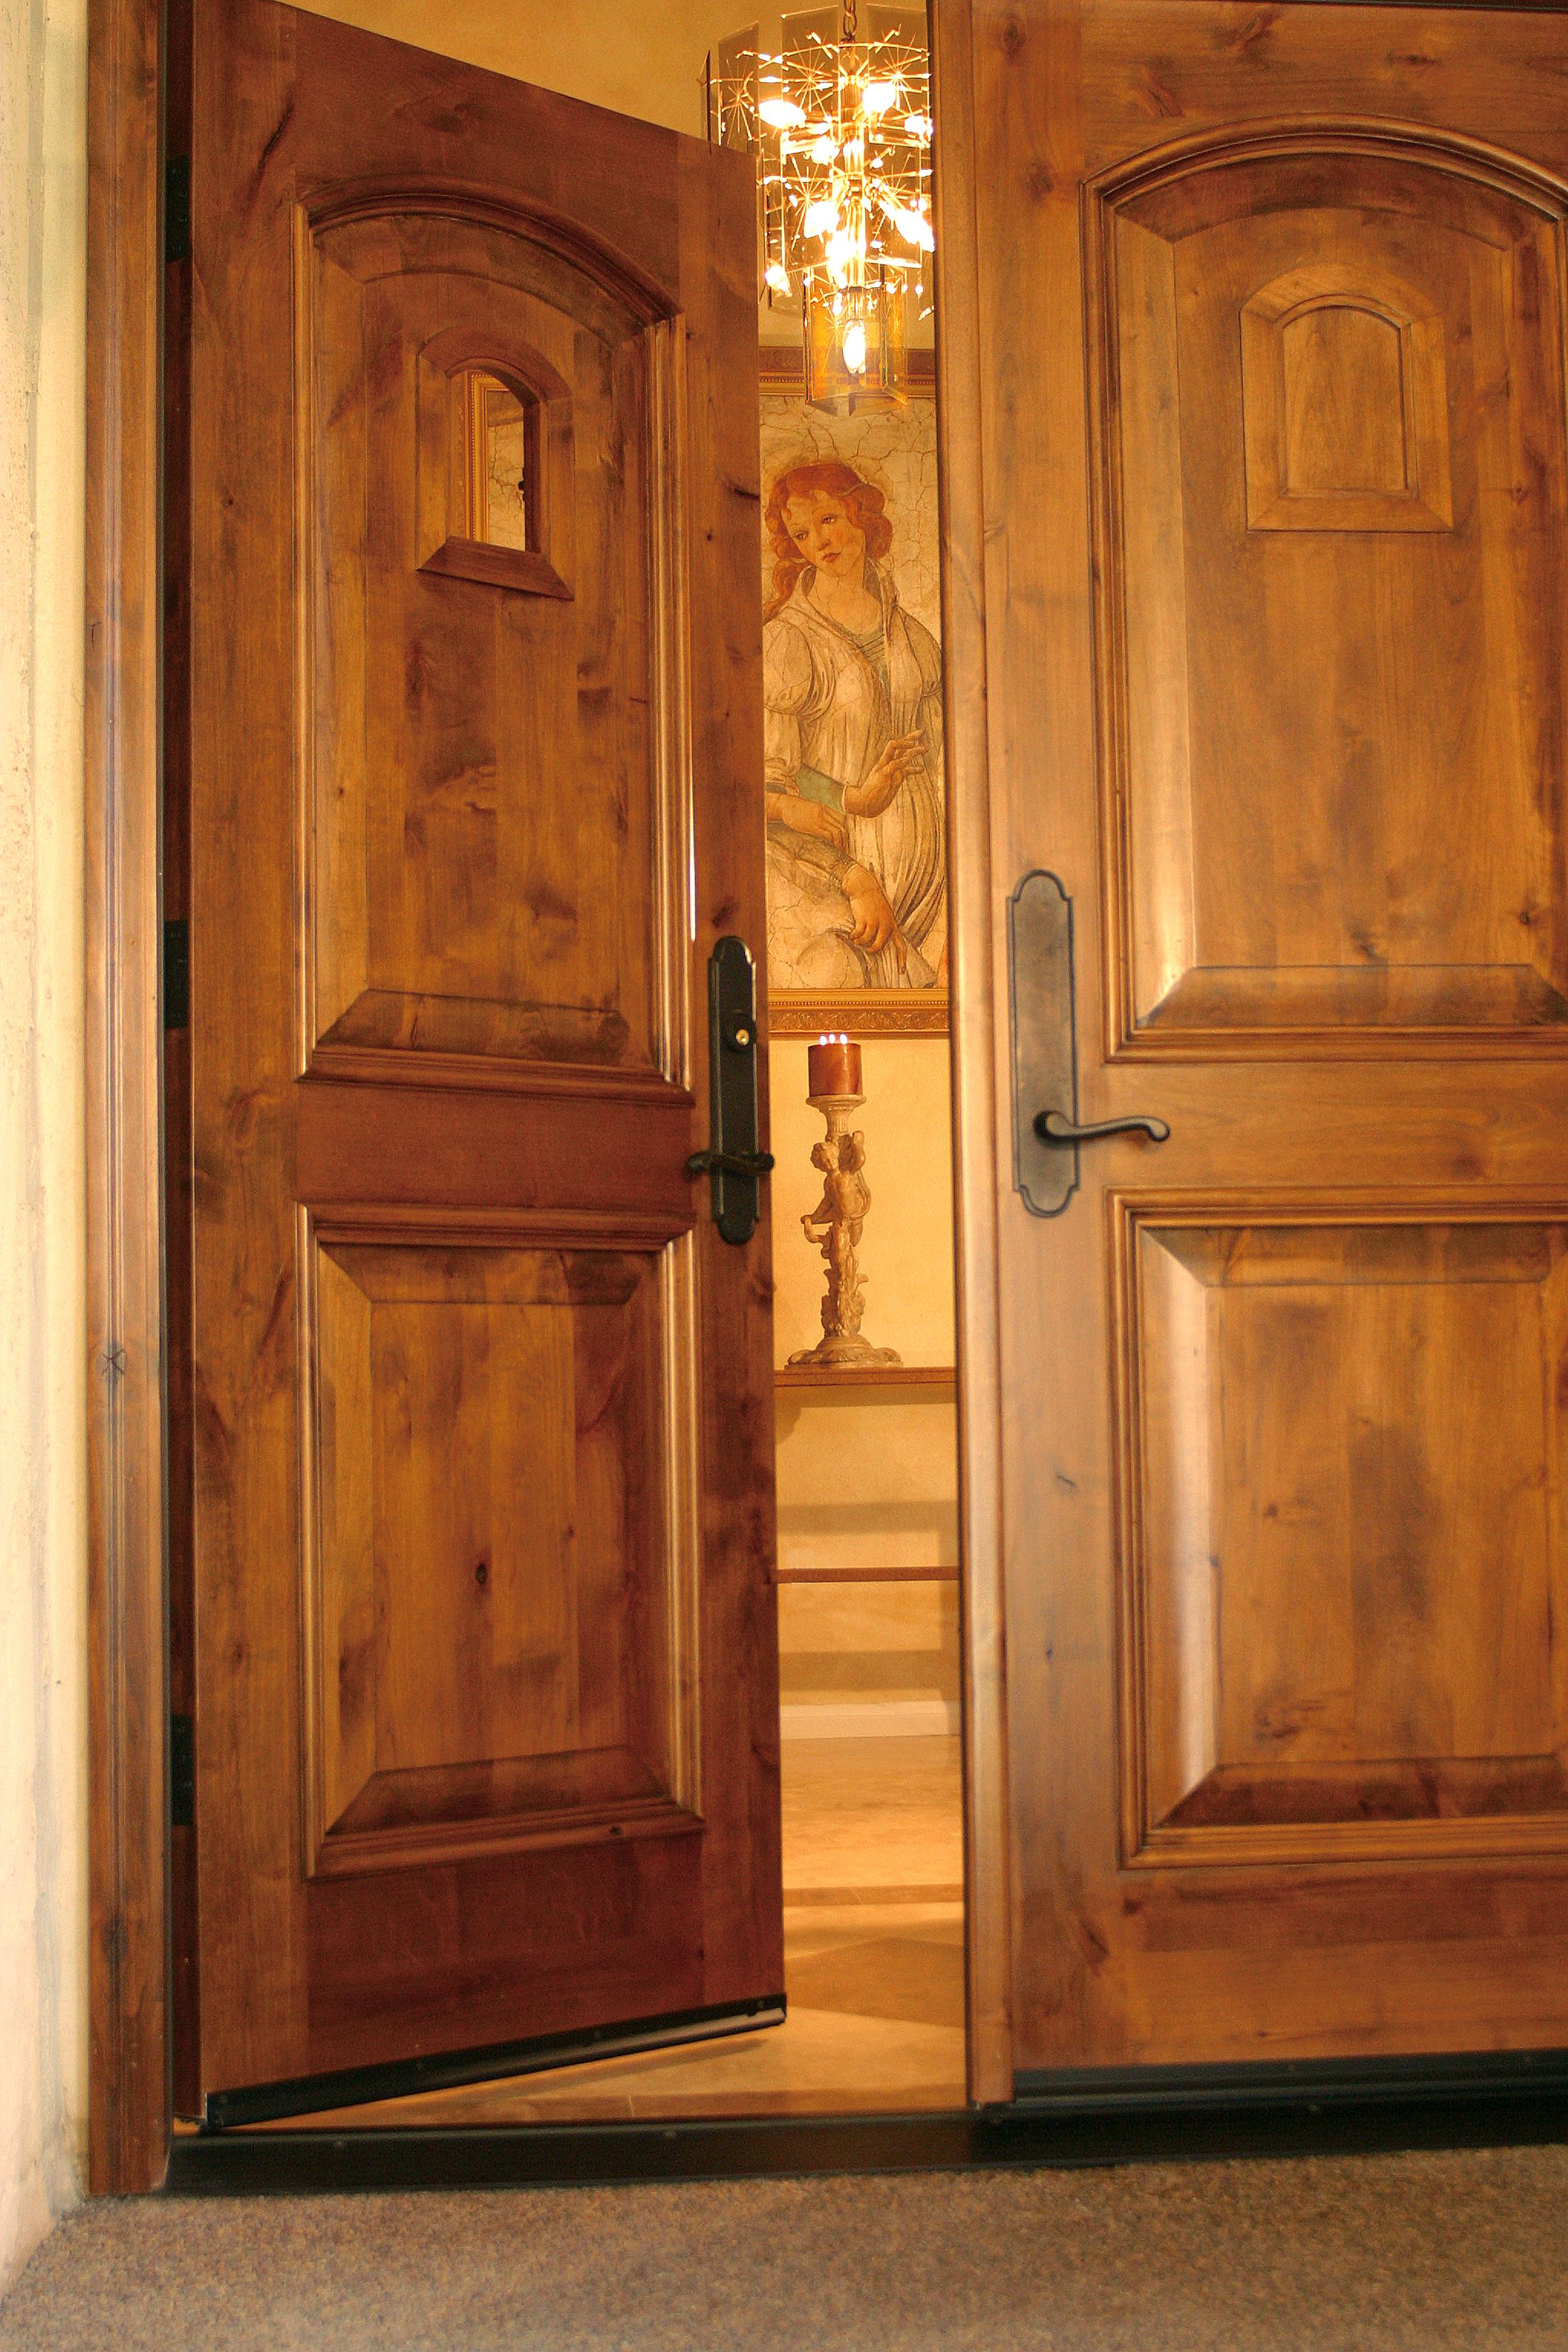 Custom Wood Entry Door By Grand Entrances In San Diego Ca Mediterranean Front Door S Mediterranean Front Doors Solid Wood Entry Doors Custom Wood Entry Door